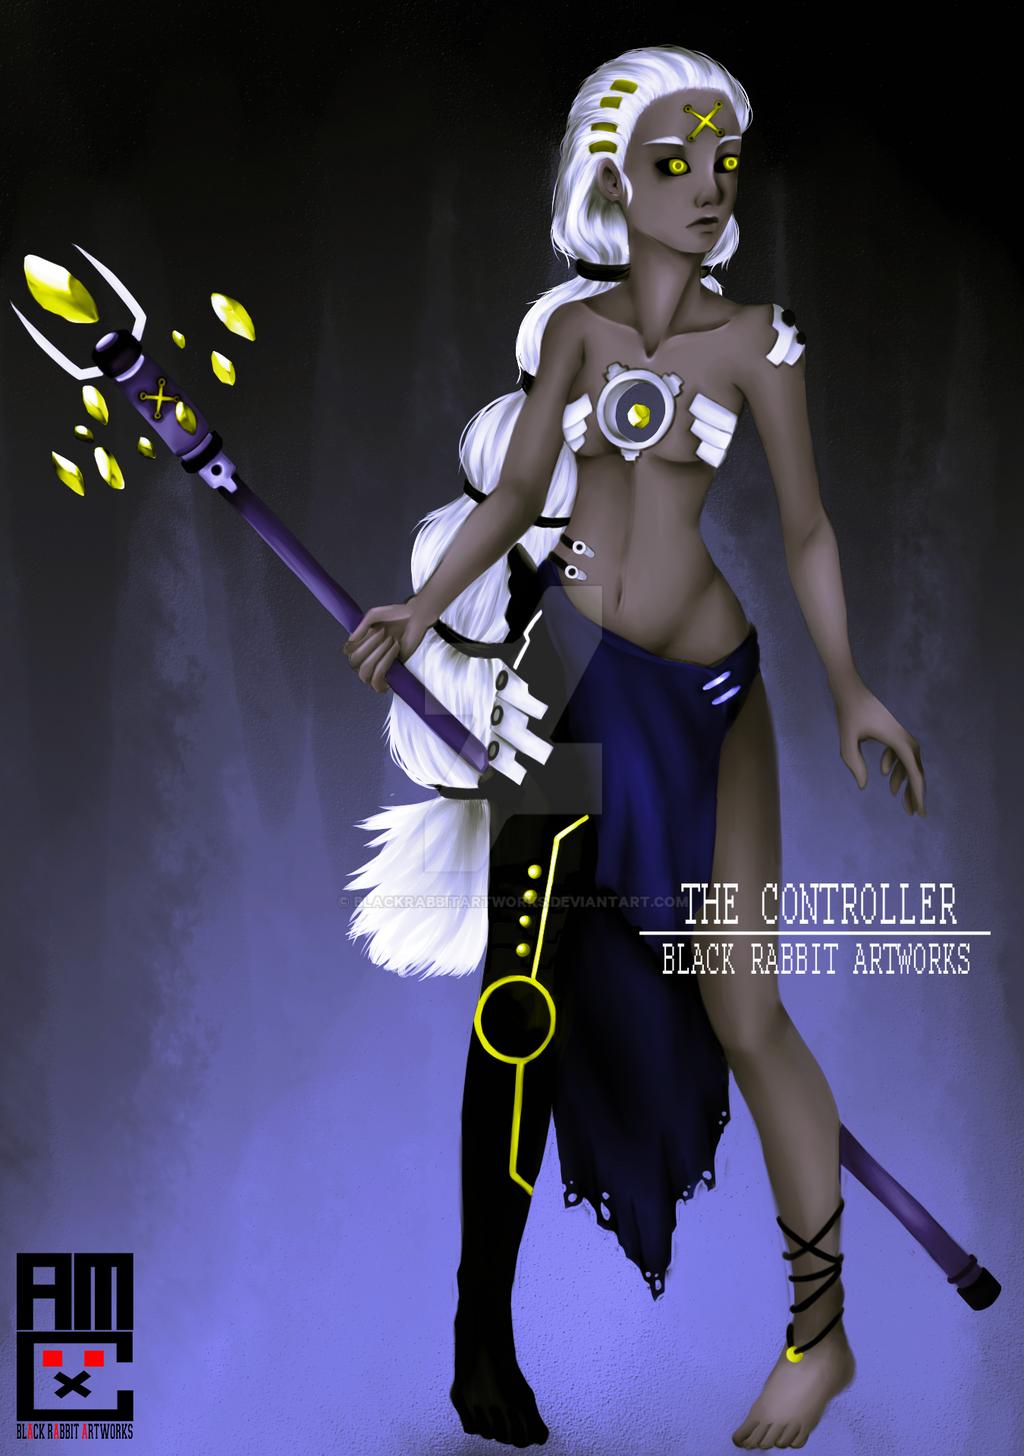 The Controller by blackrabbitartworks